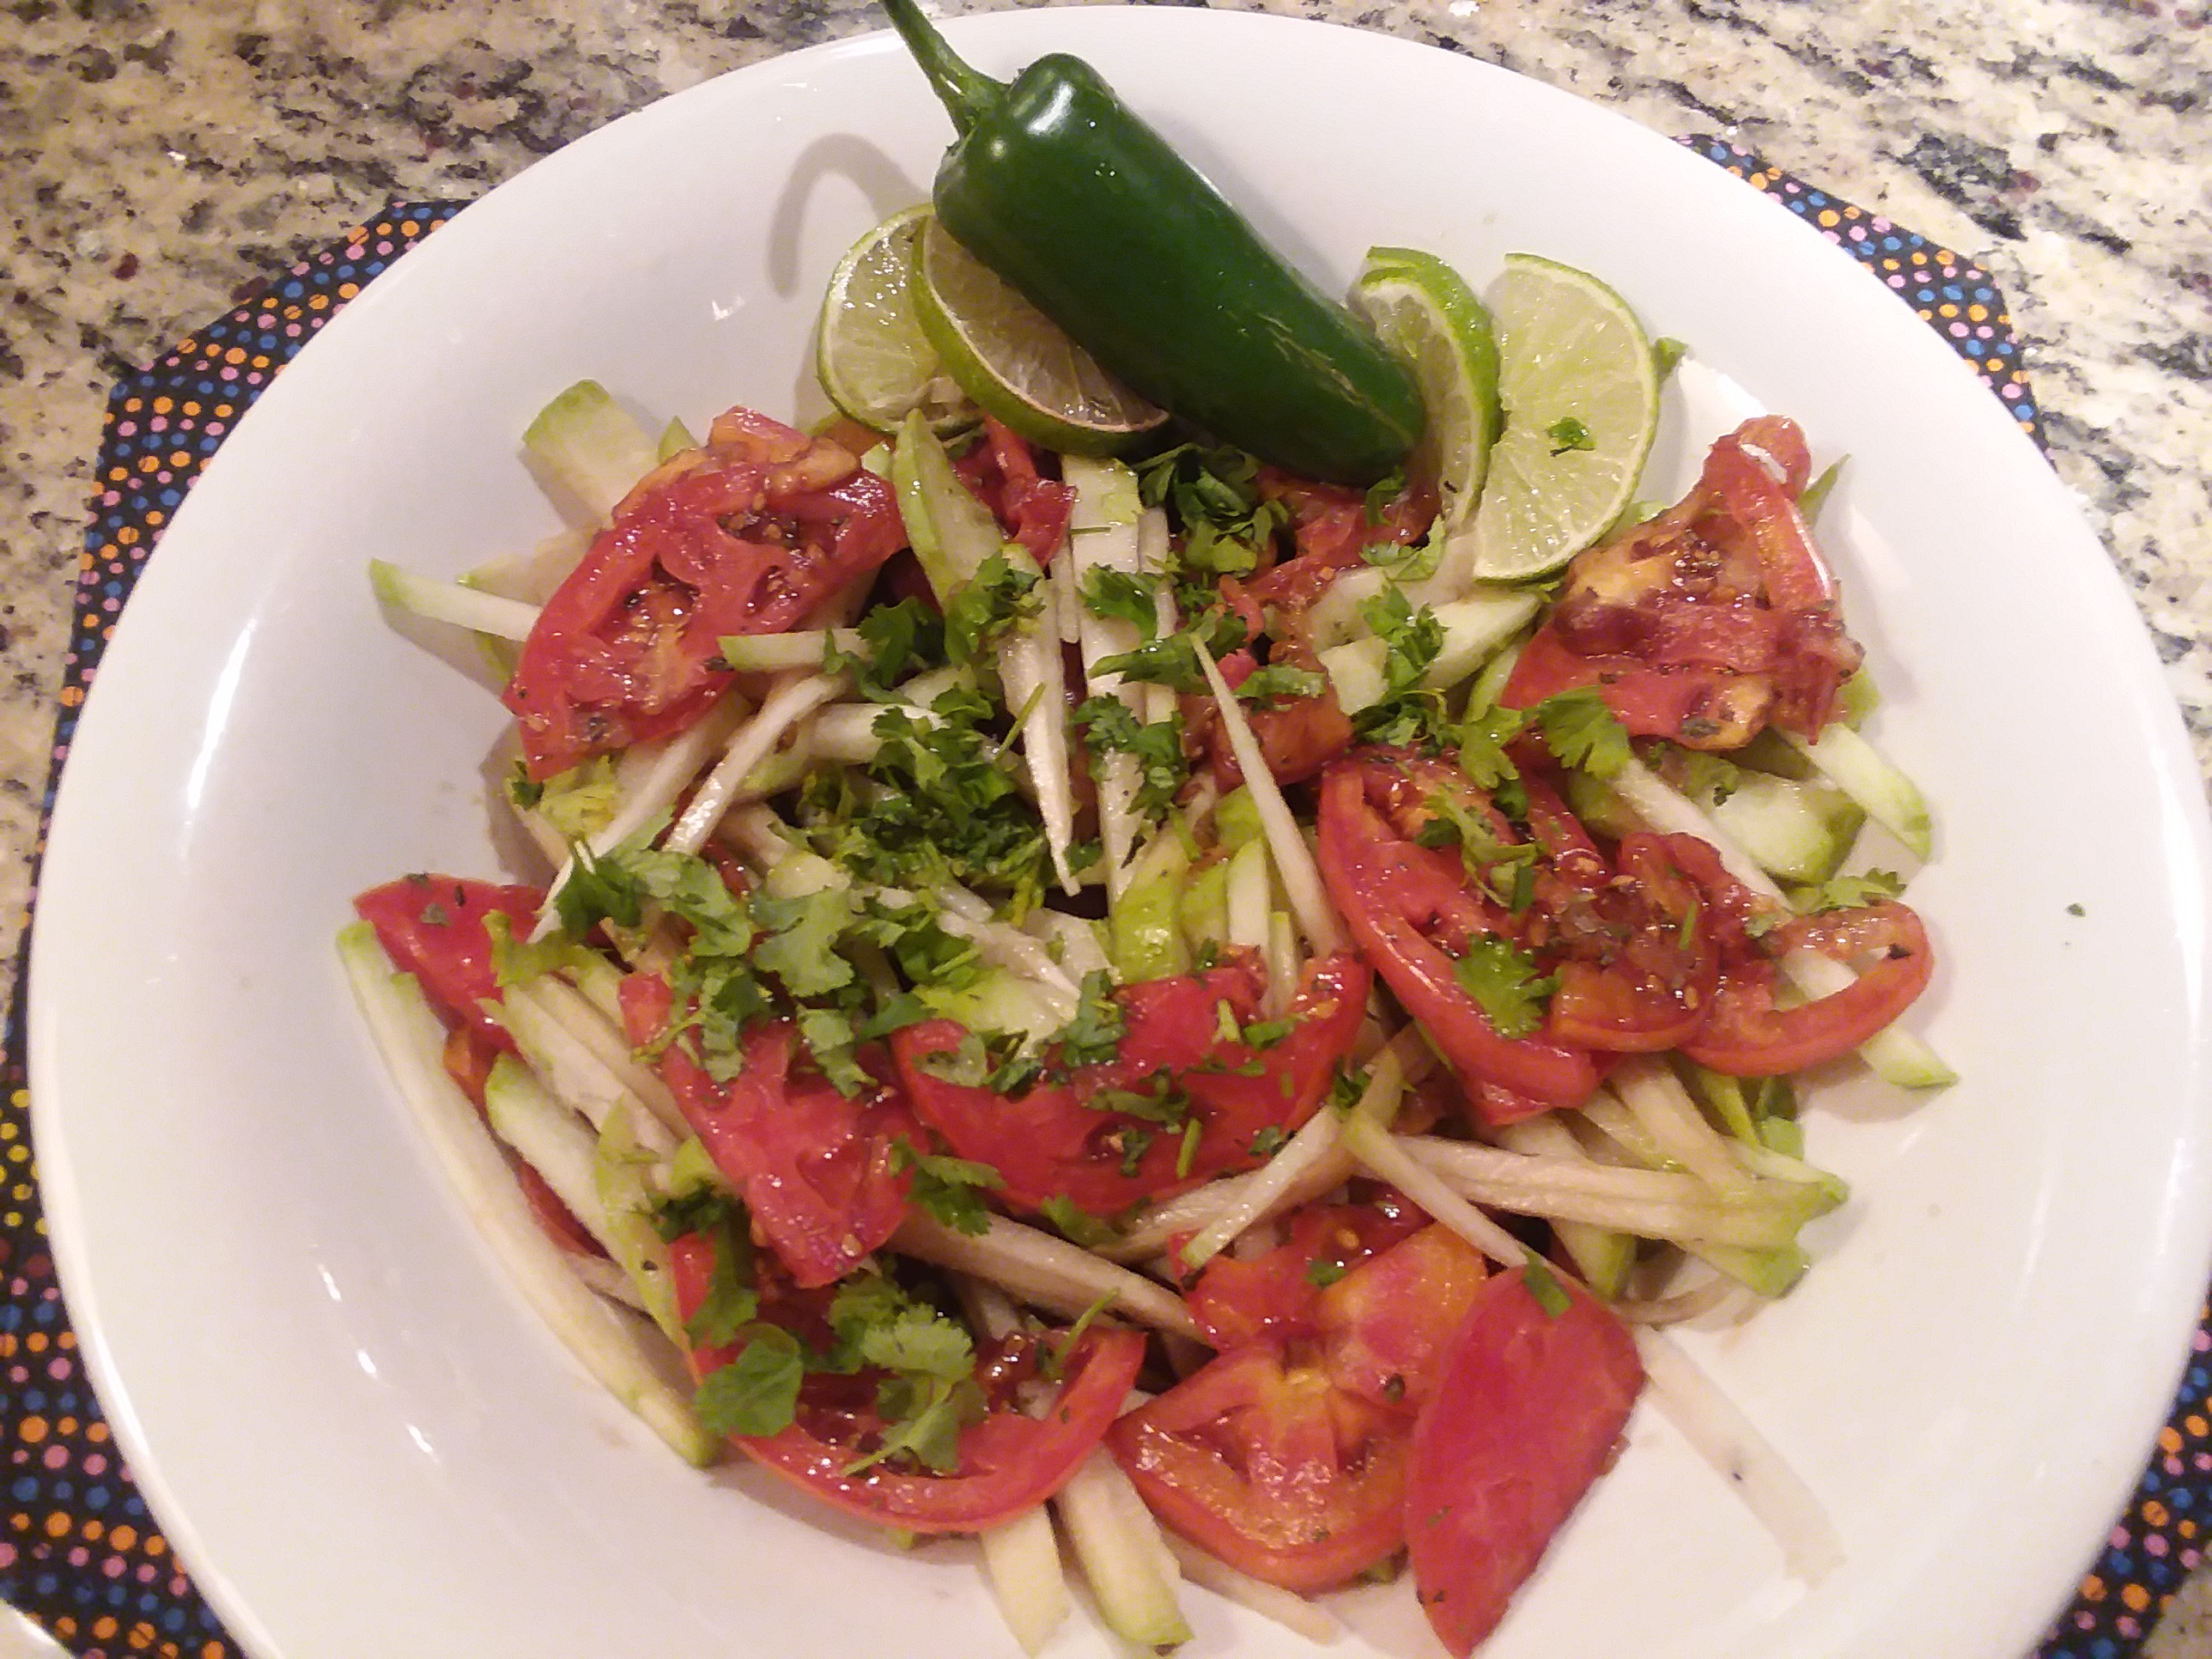 Spicy Balsamic Tomato Salad